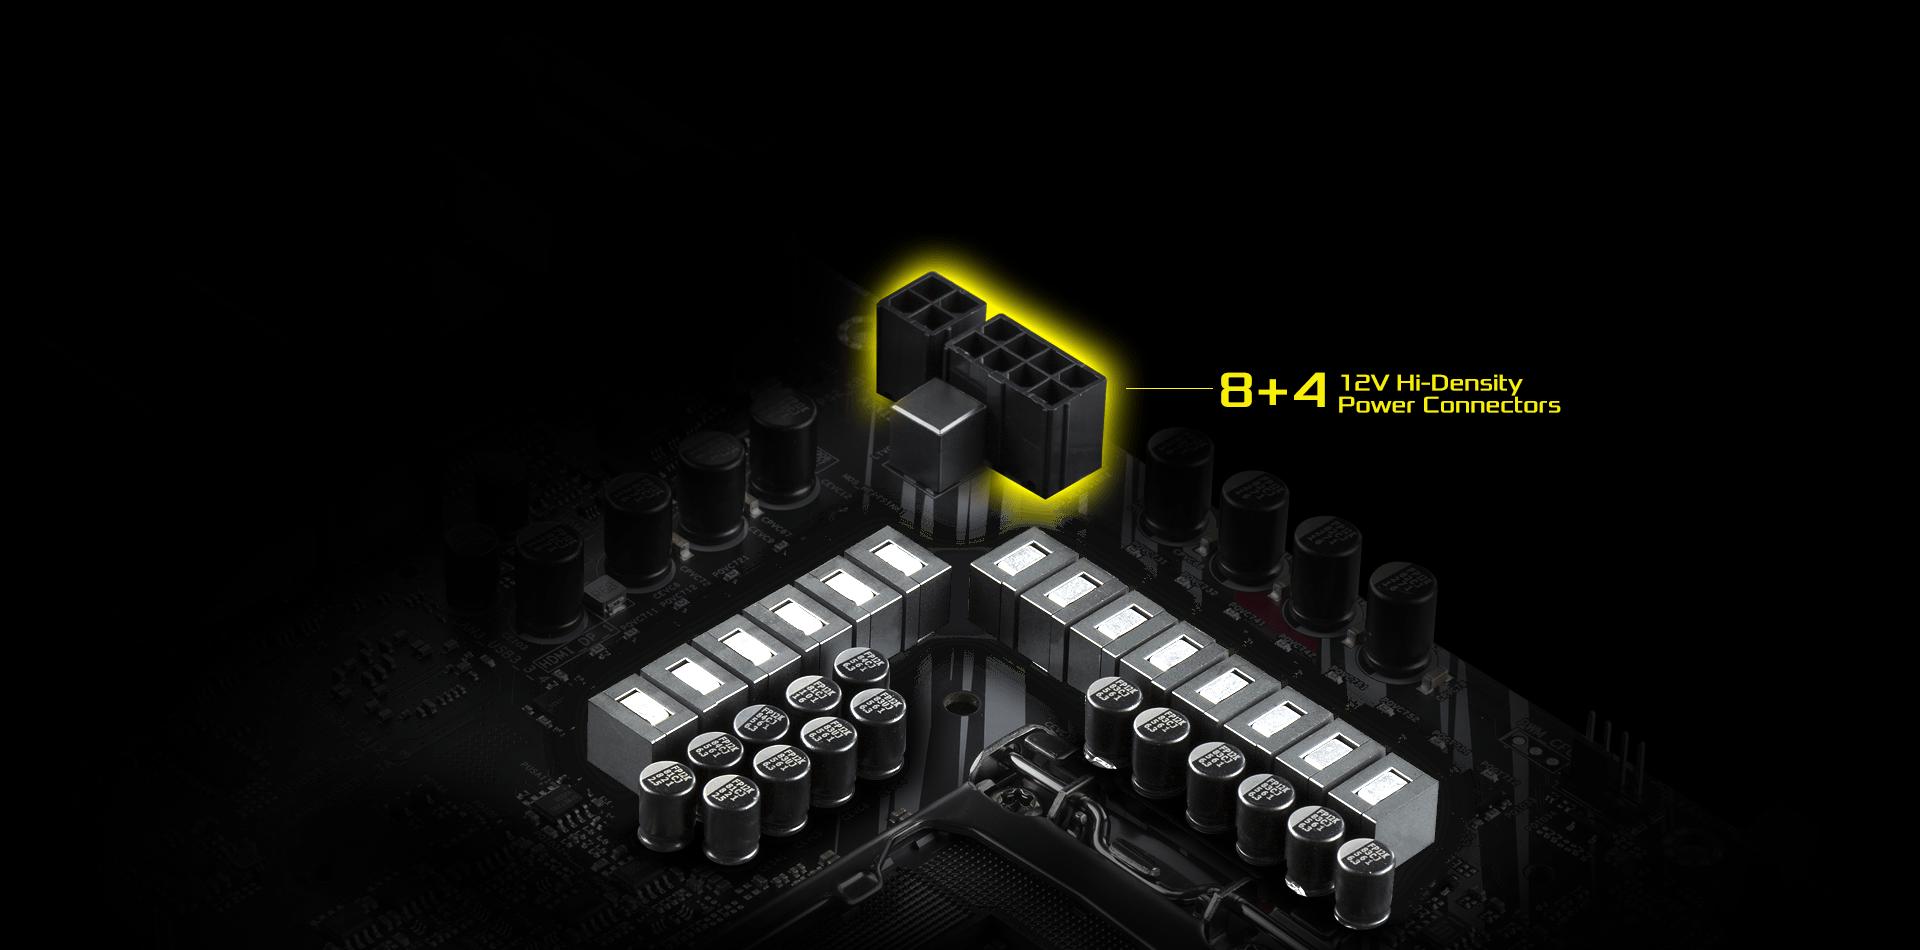 ASRock > Z390 Phantom Gaming 9